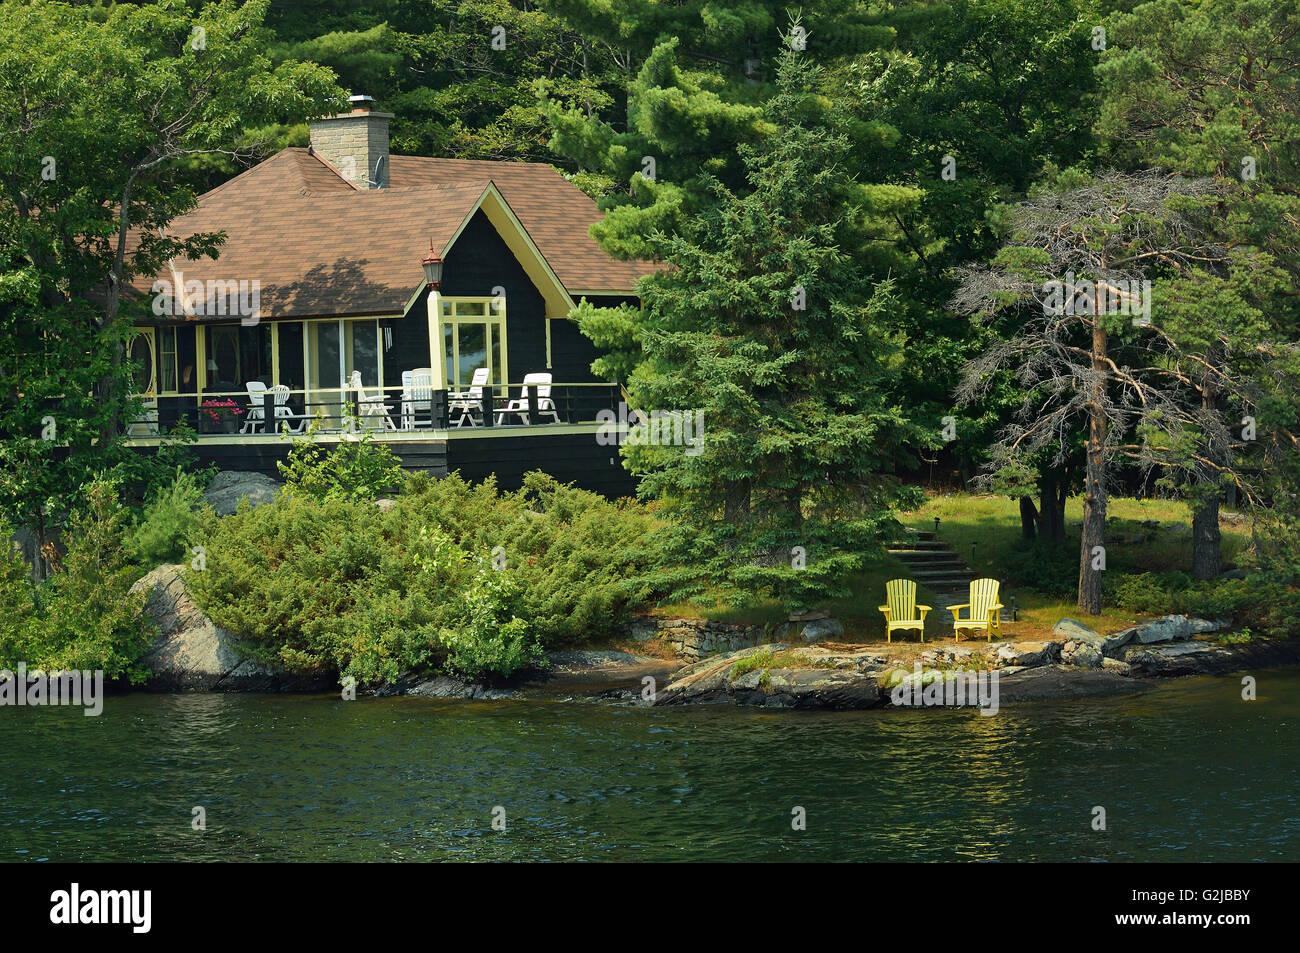 Cottage, Muskoka Country, Ontario, Canada - Stock Image